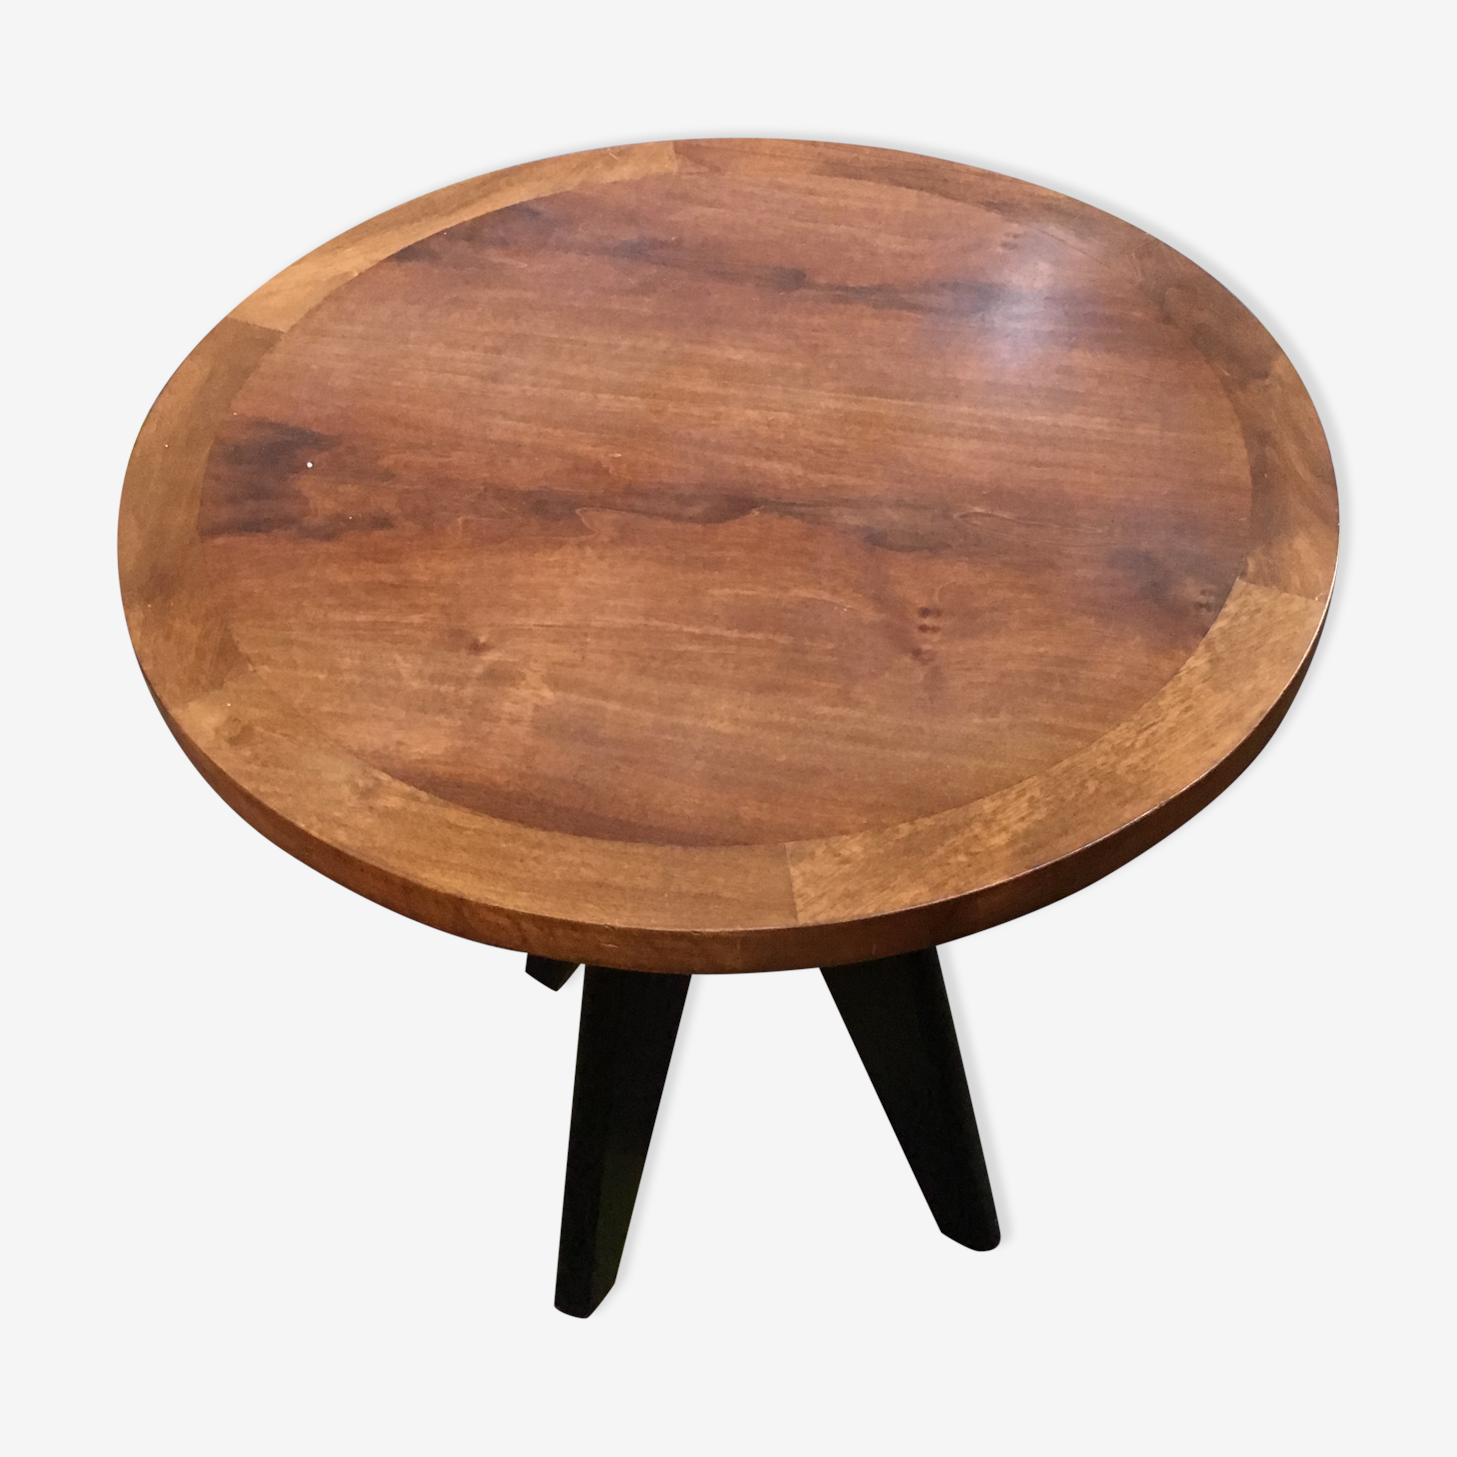 Round table wood, base quadripode